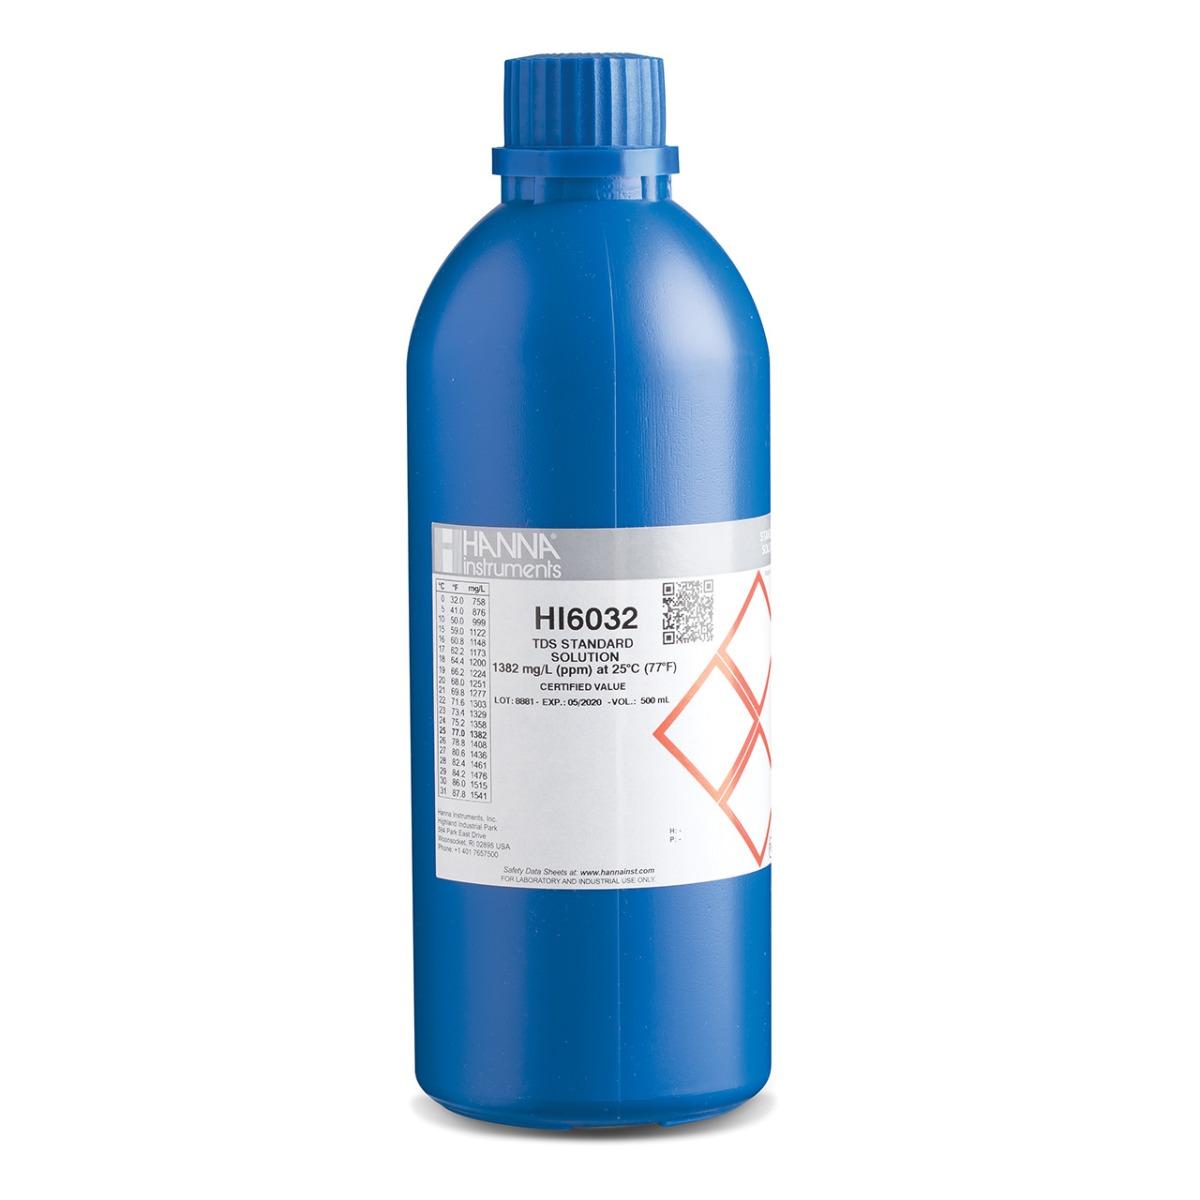 HI6032 1382 ppm (mg/L) TDS Calibration Standard (500mL)